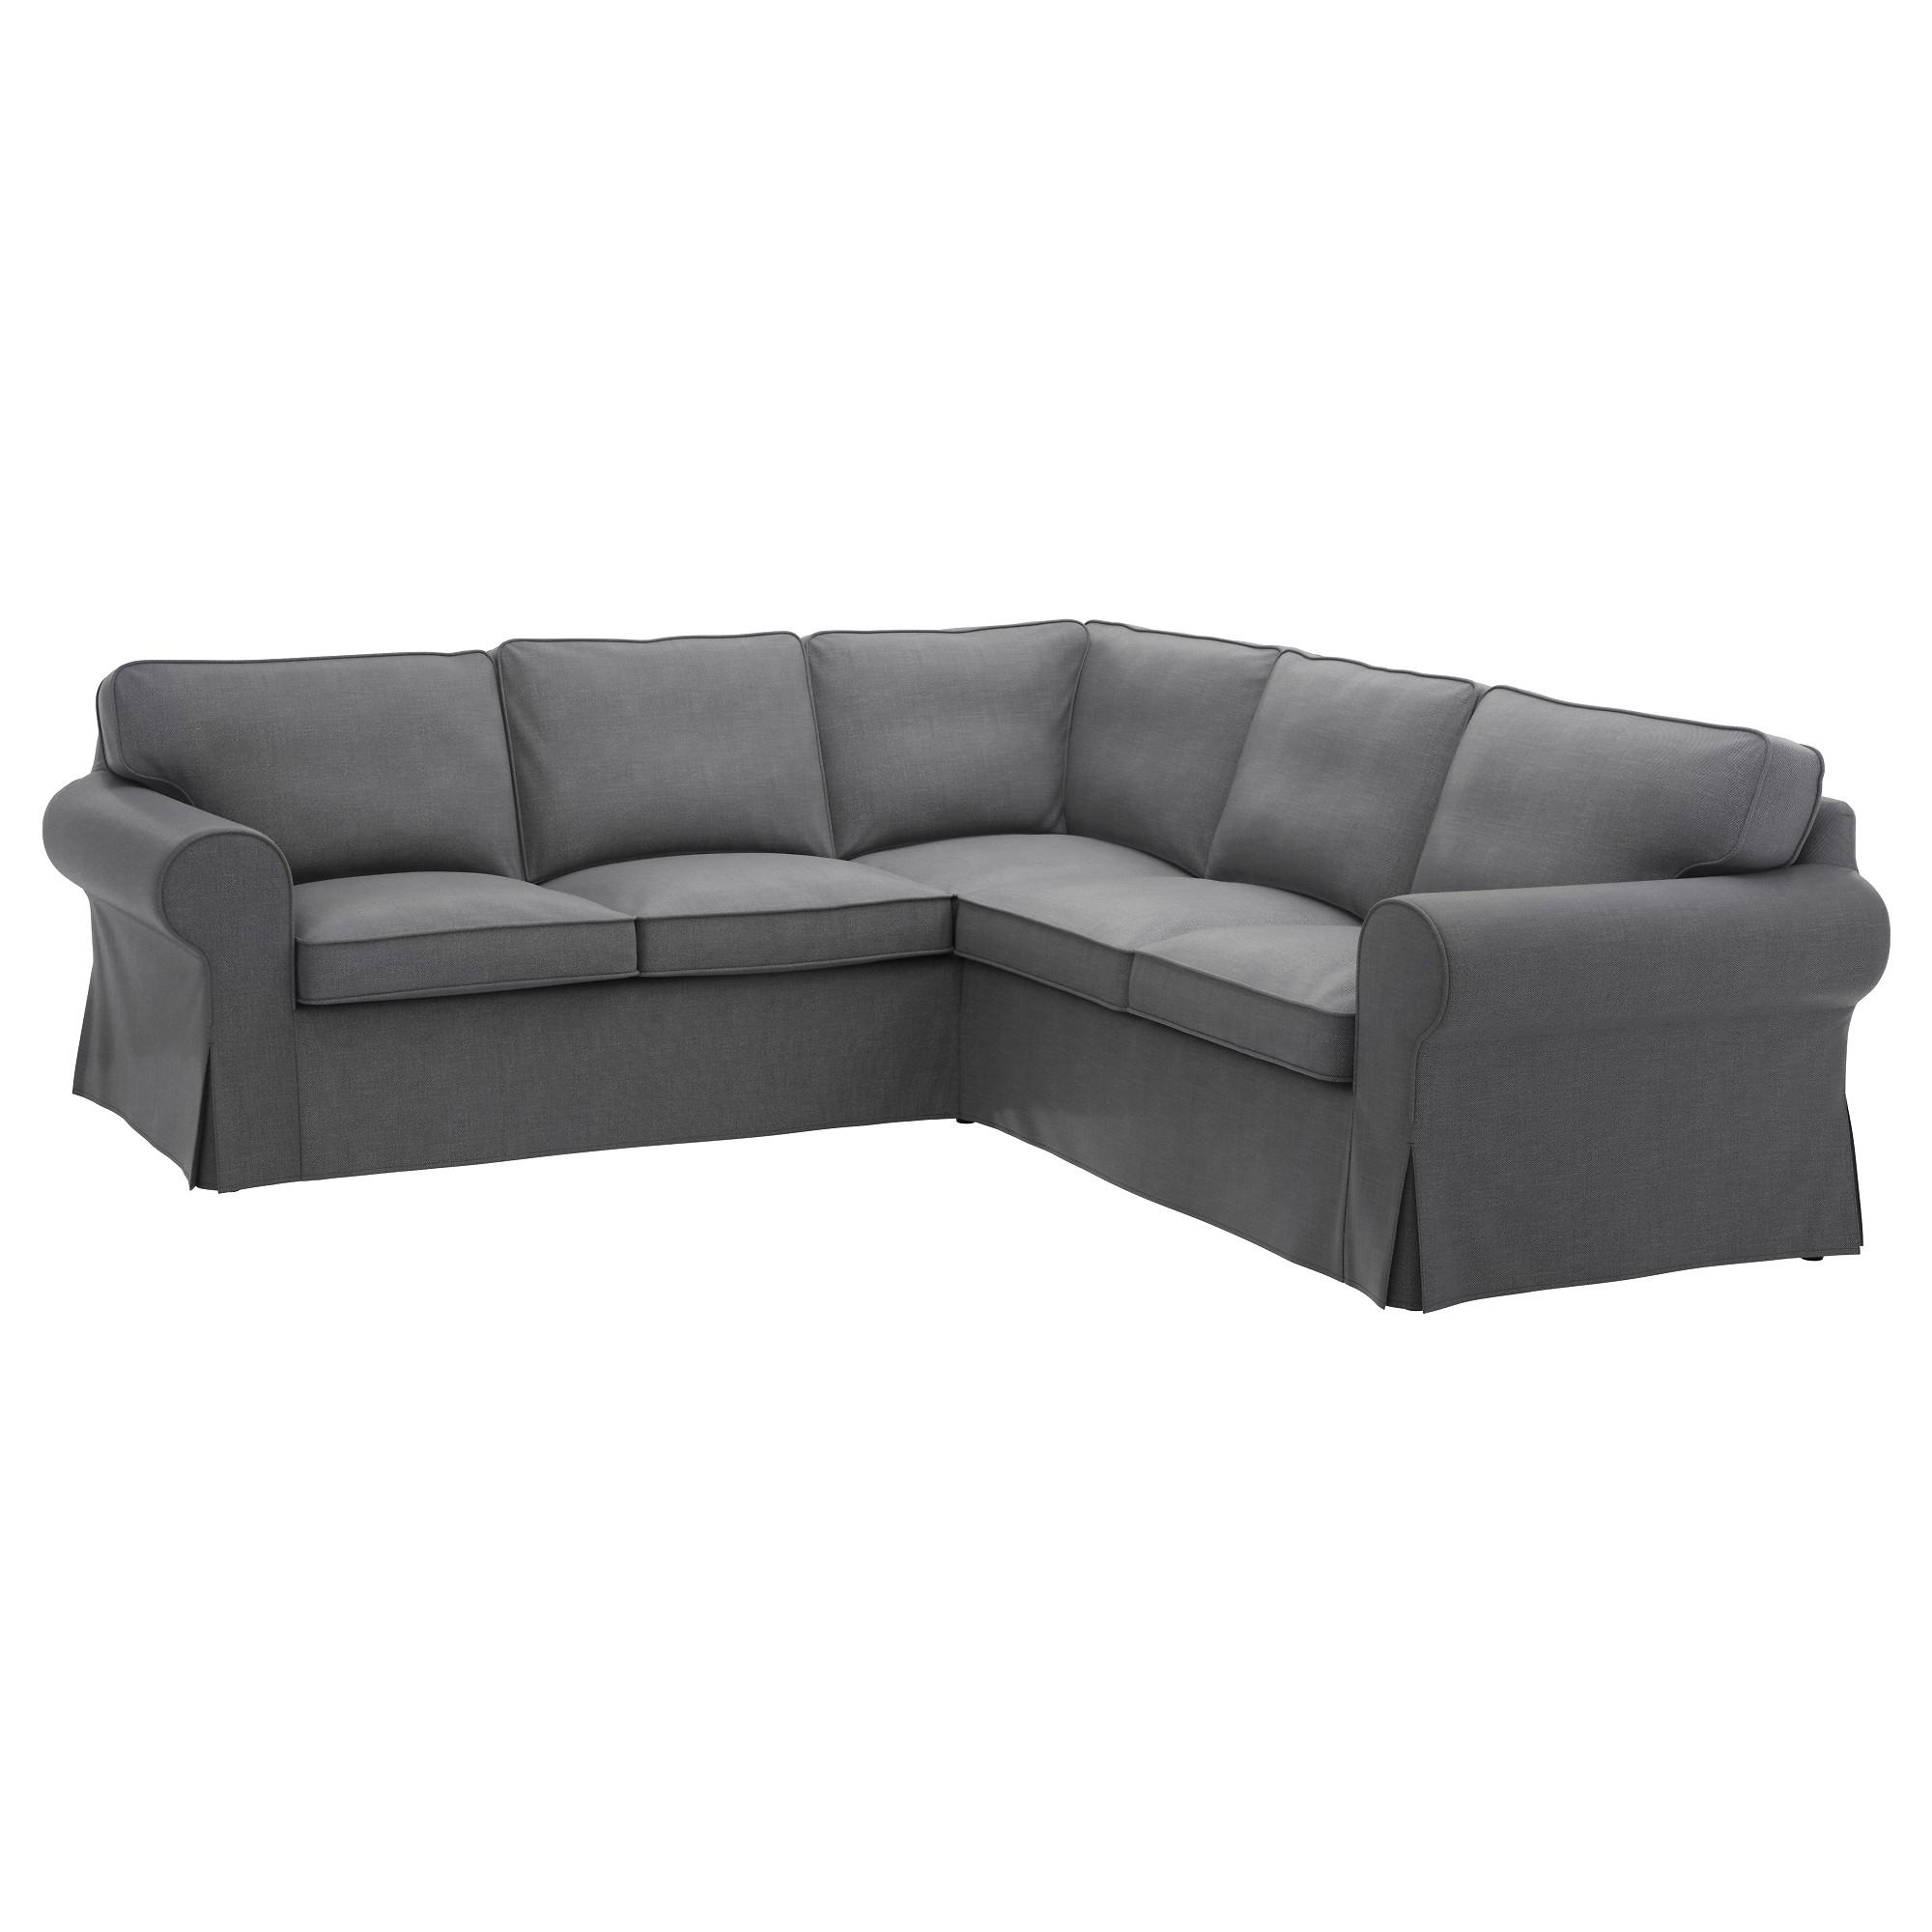 Most Popular Ektorp Sectional, 4 Seat Corner – Nordvalla Dark Gray – Ikea For Memphis Sectional Sofas (View 15 of 20)